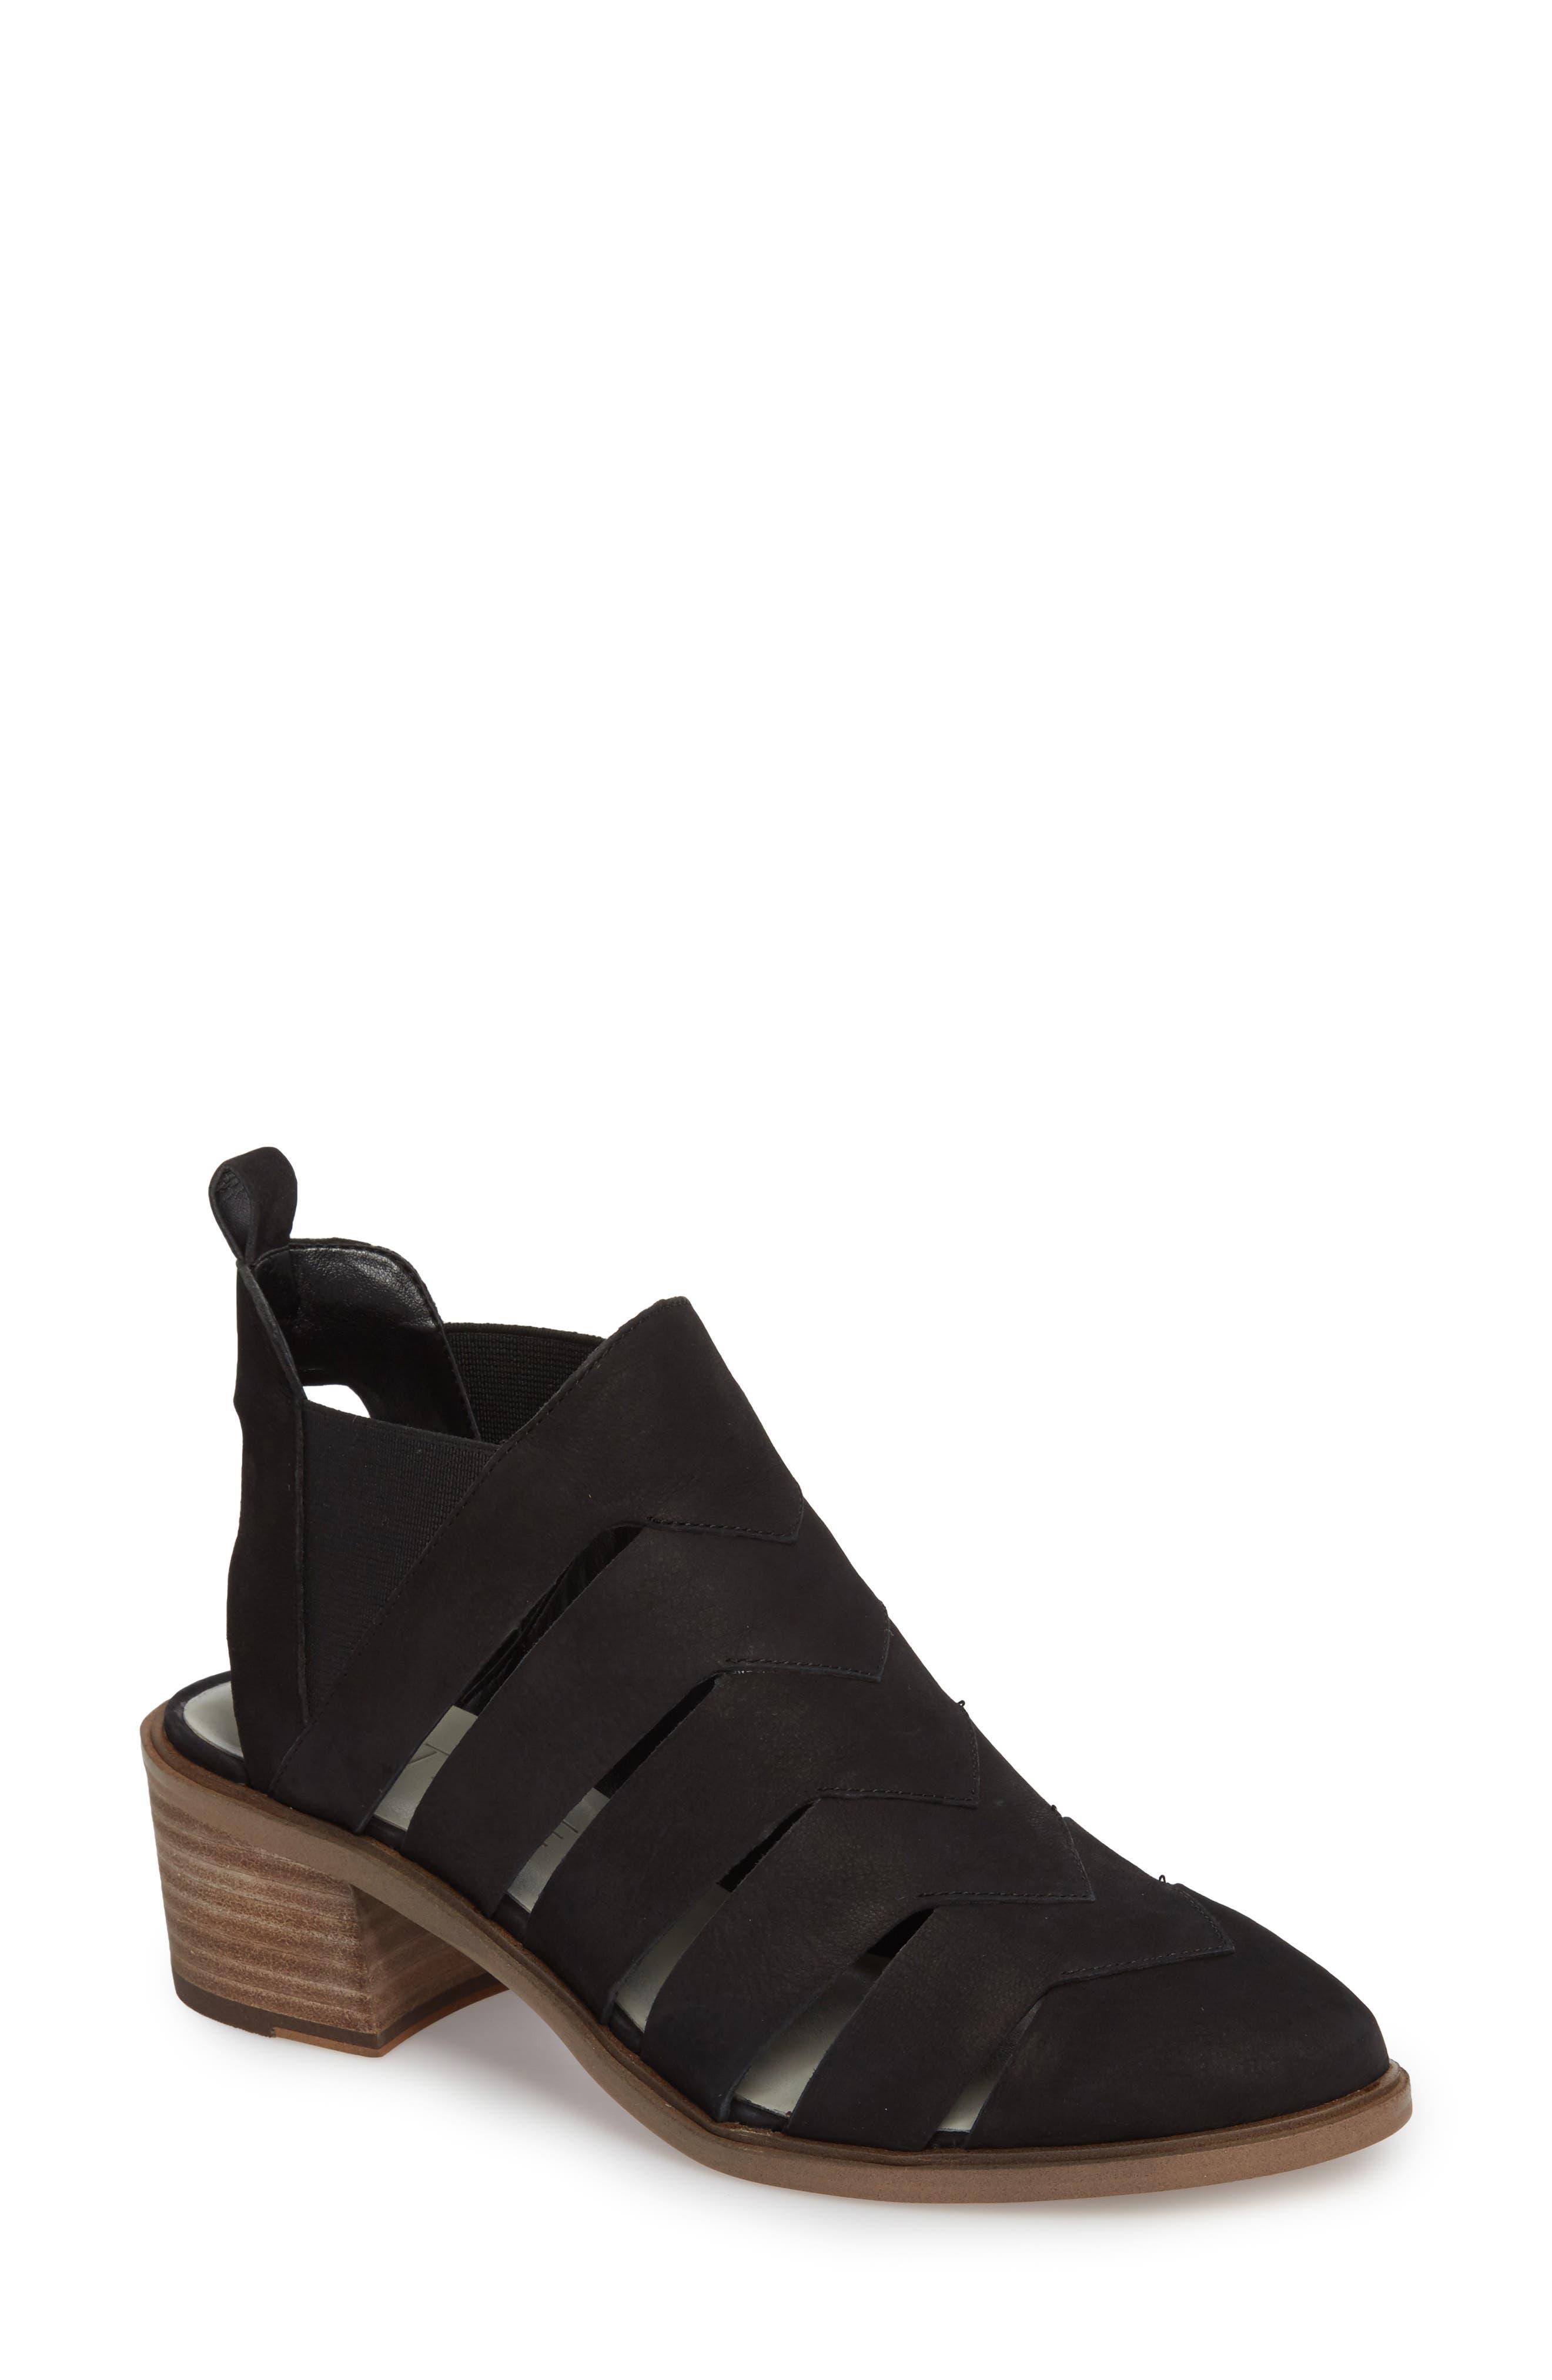 Amilee Bootie,                             Main thumbnail 1, color,                             Black Nubuck Leather